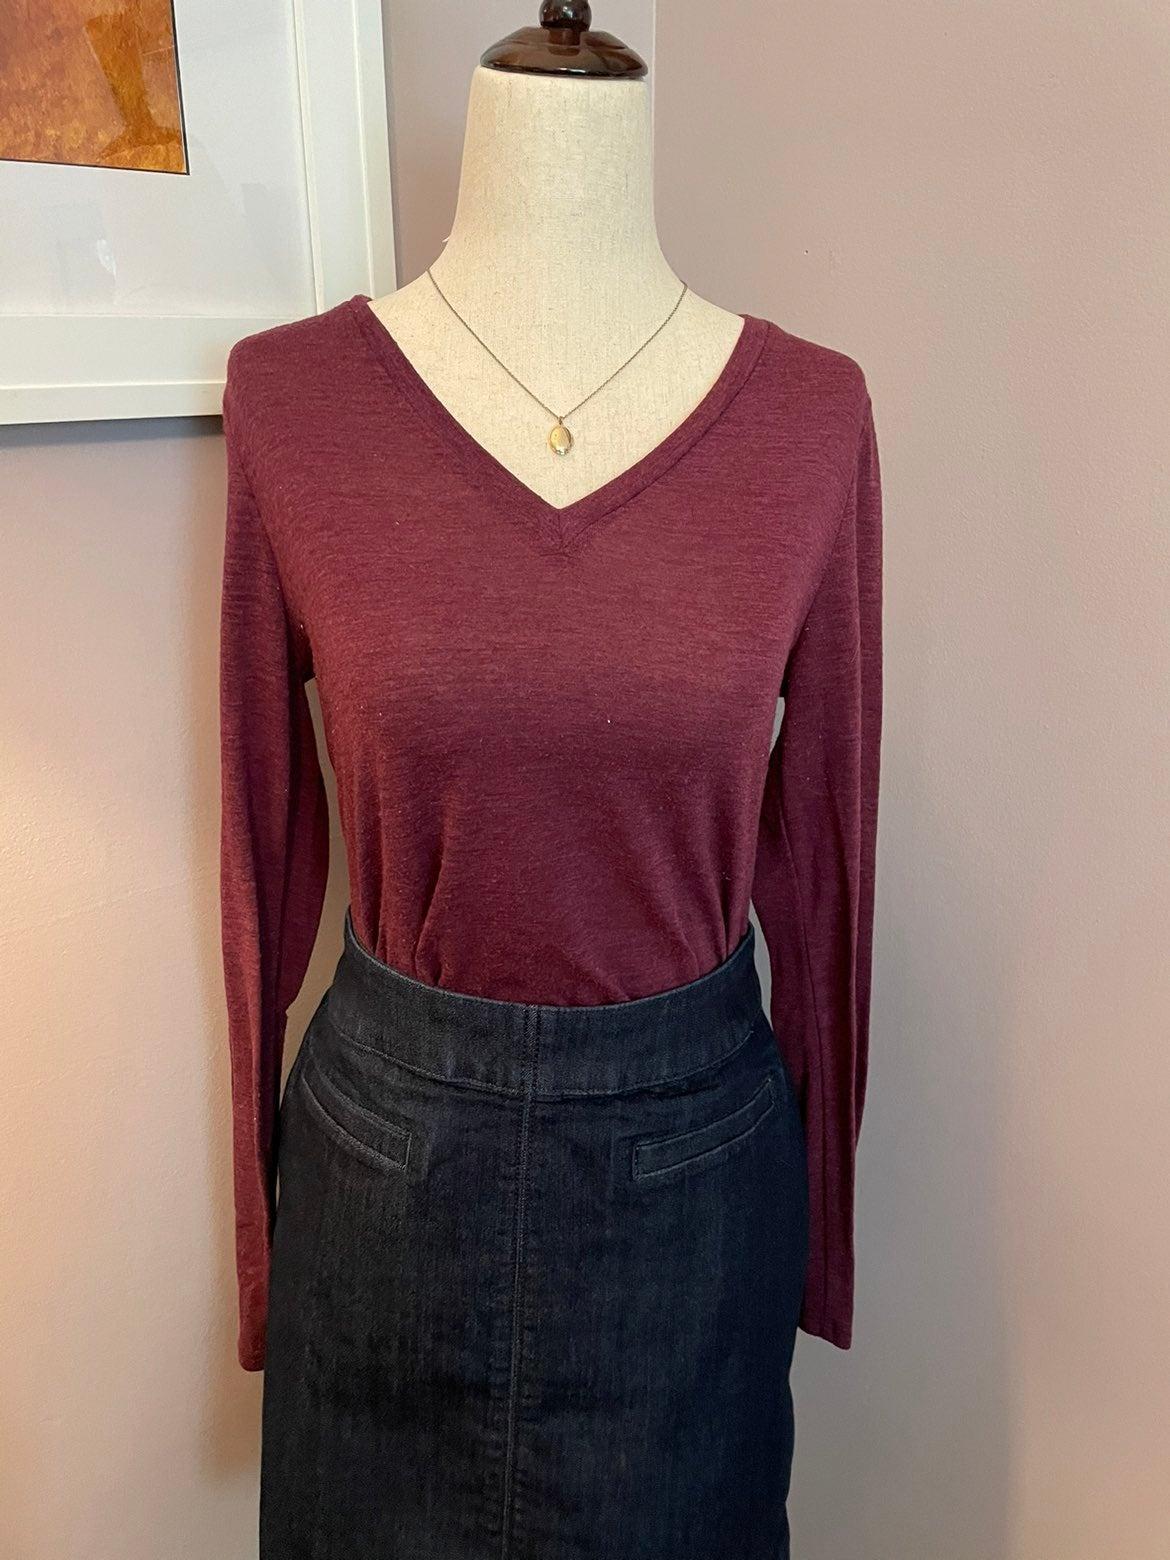 LOFT Red Knit Tunic Top